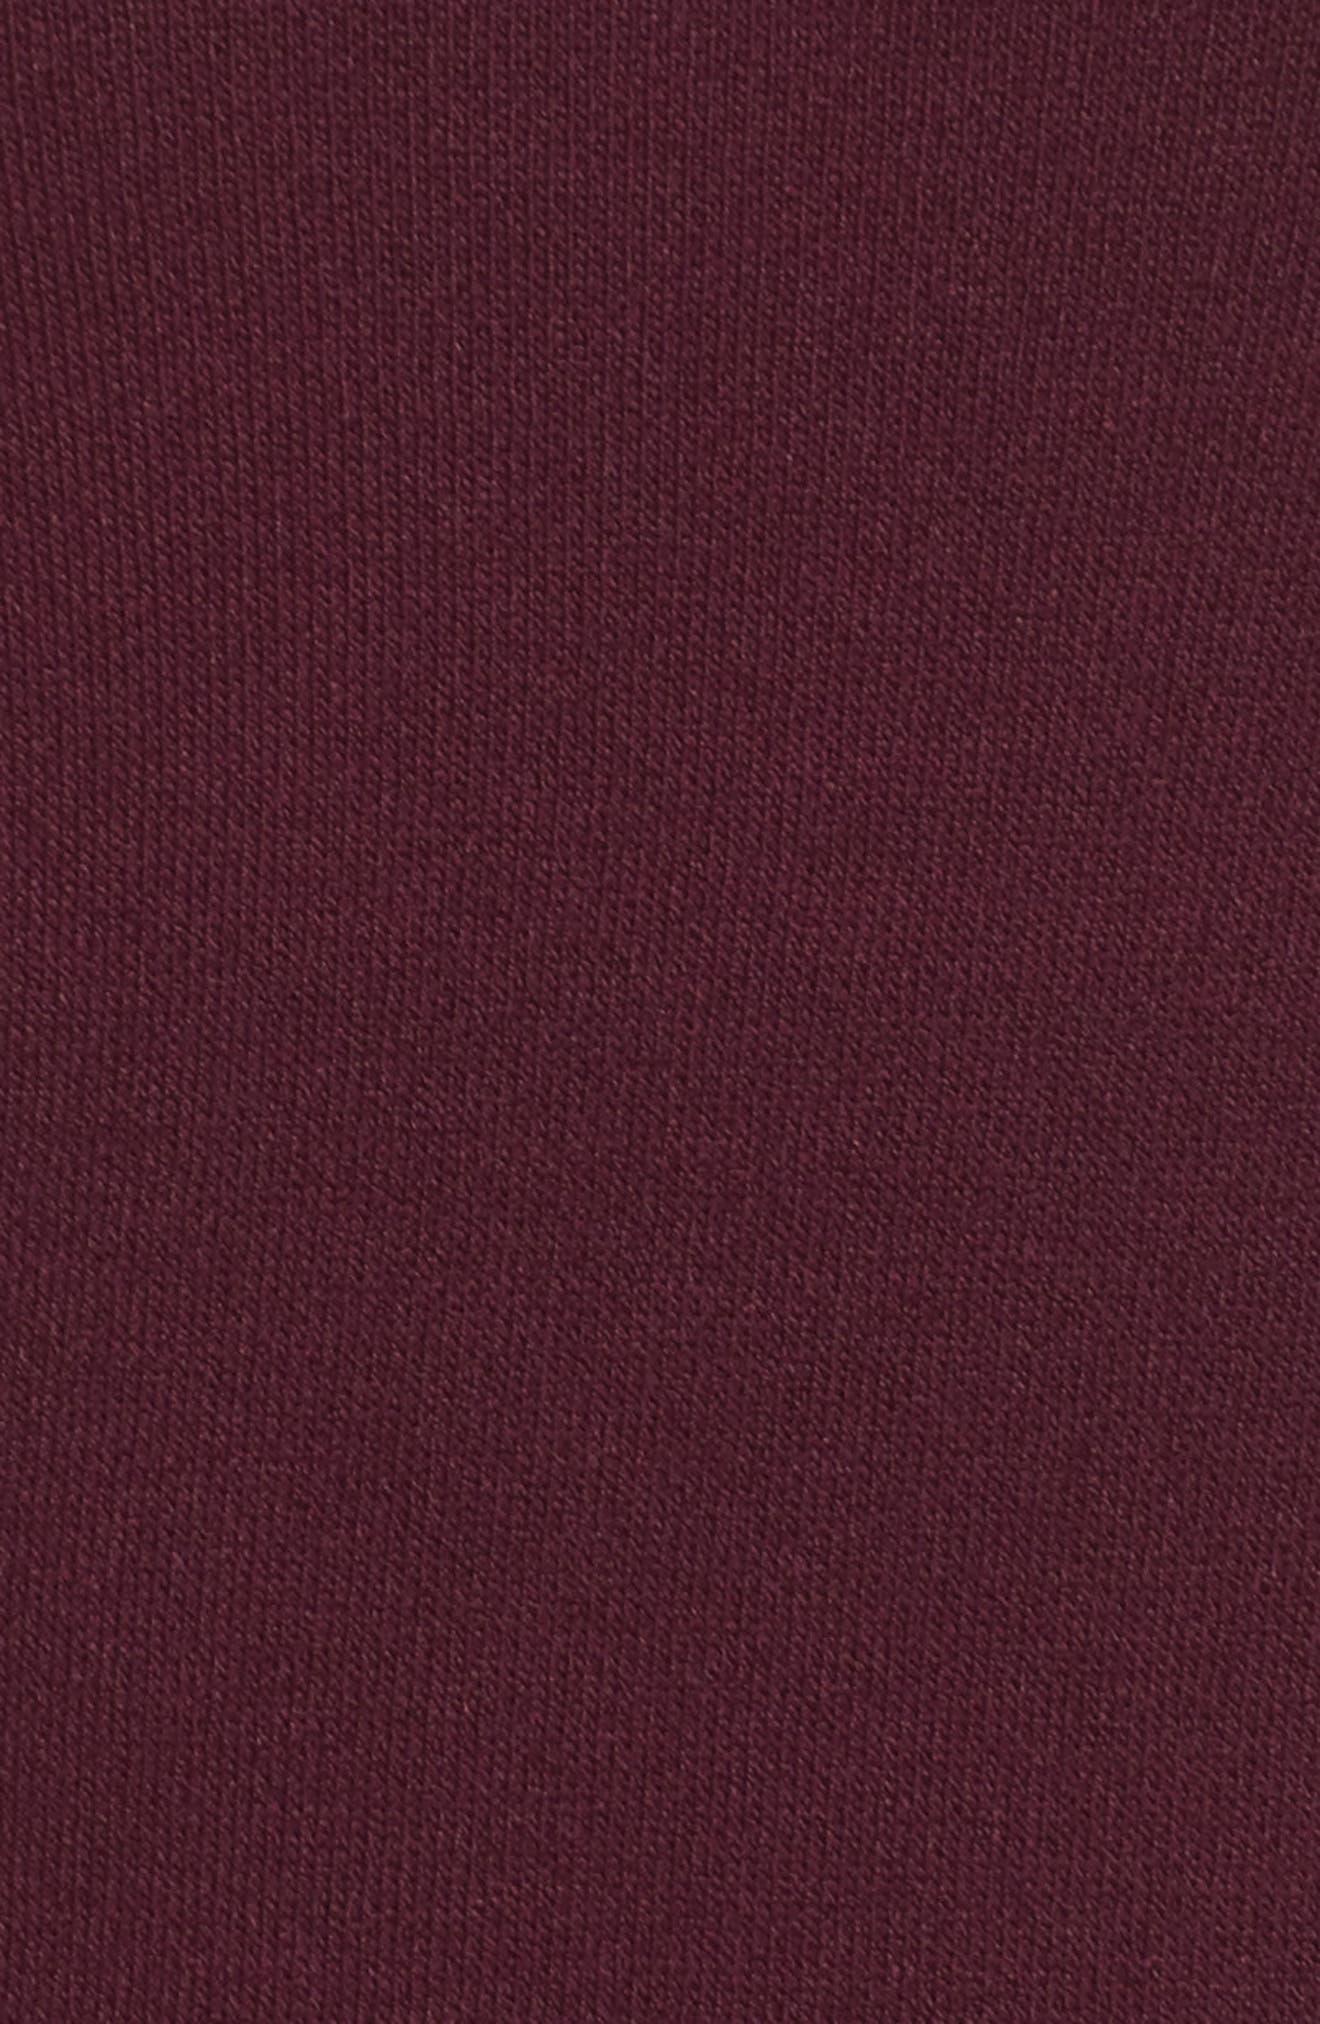 Cold Shoulder Knit Body-Con Dress,                             Alternate thumbnail 5, color,                             500